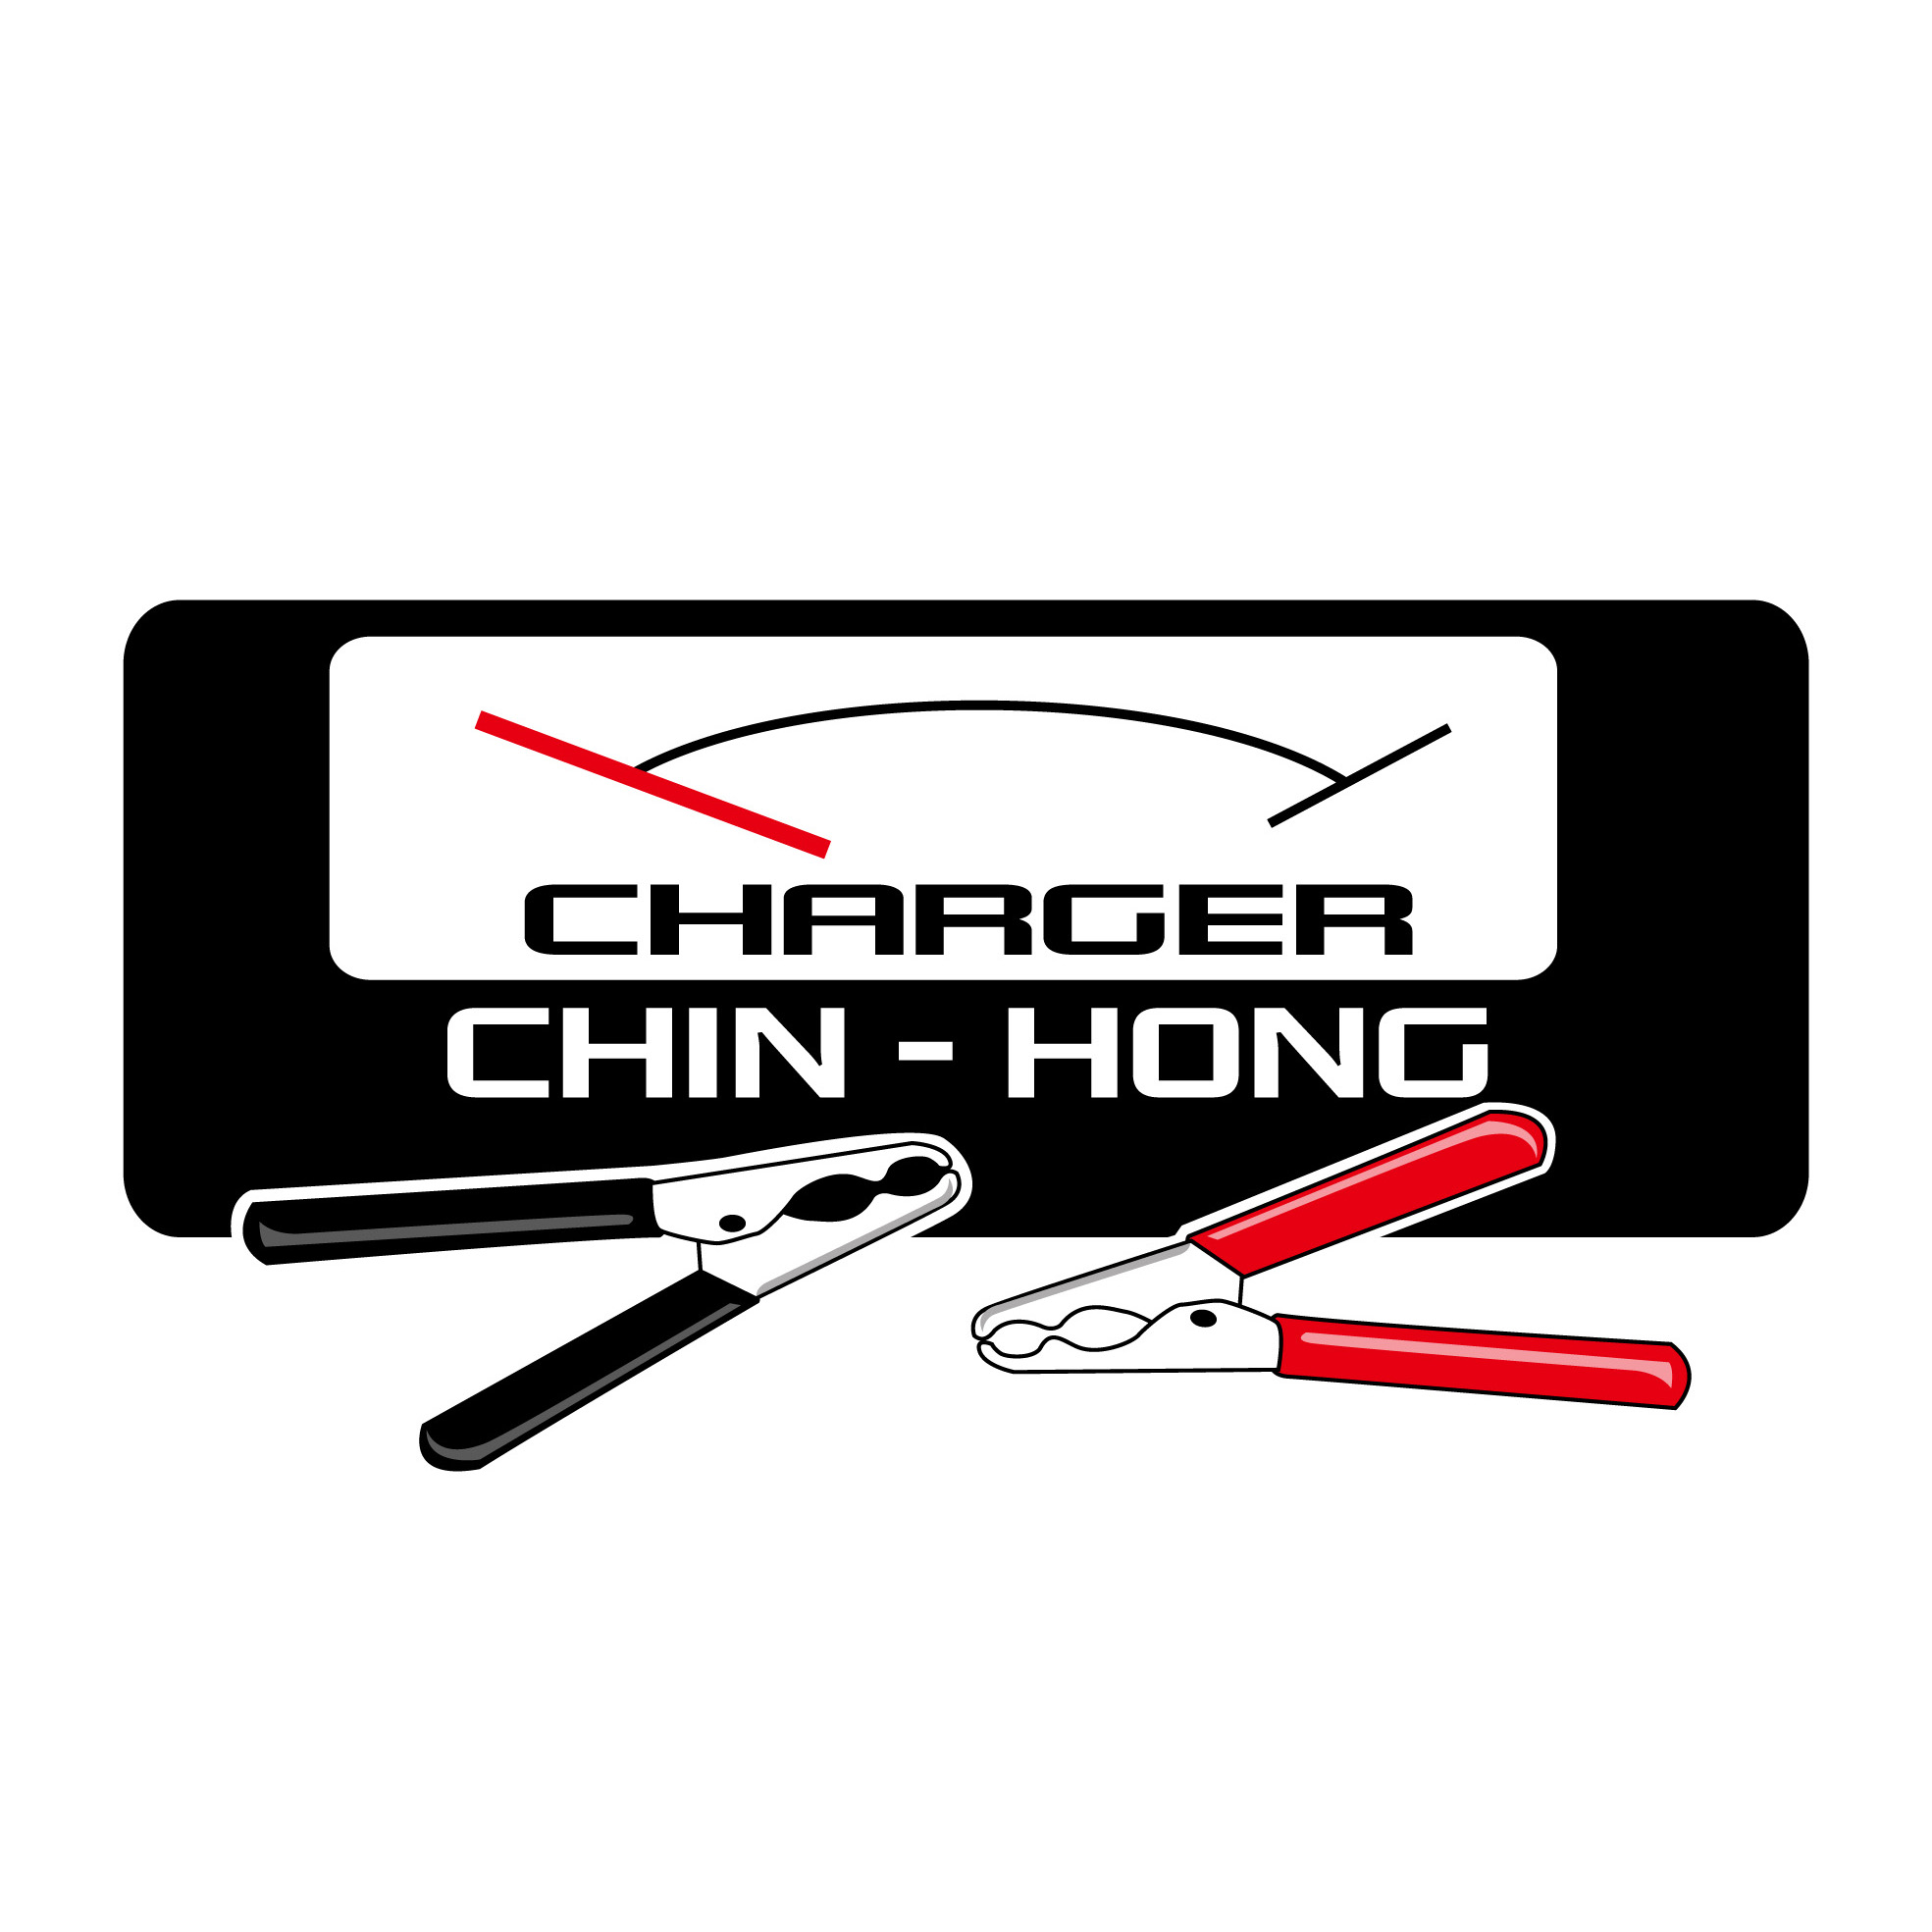 Chin Hong Battery Charger Co., Ltd